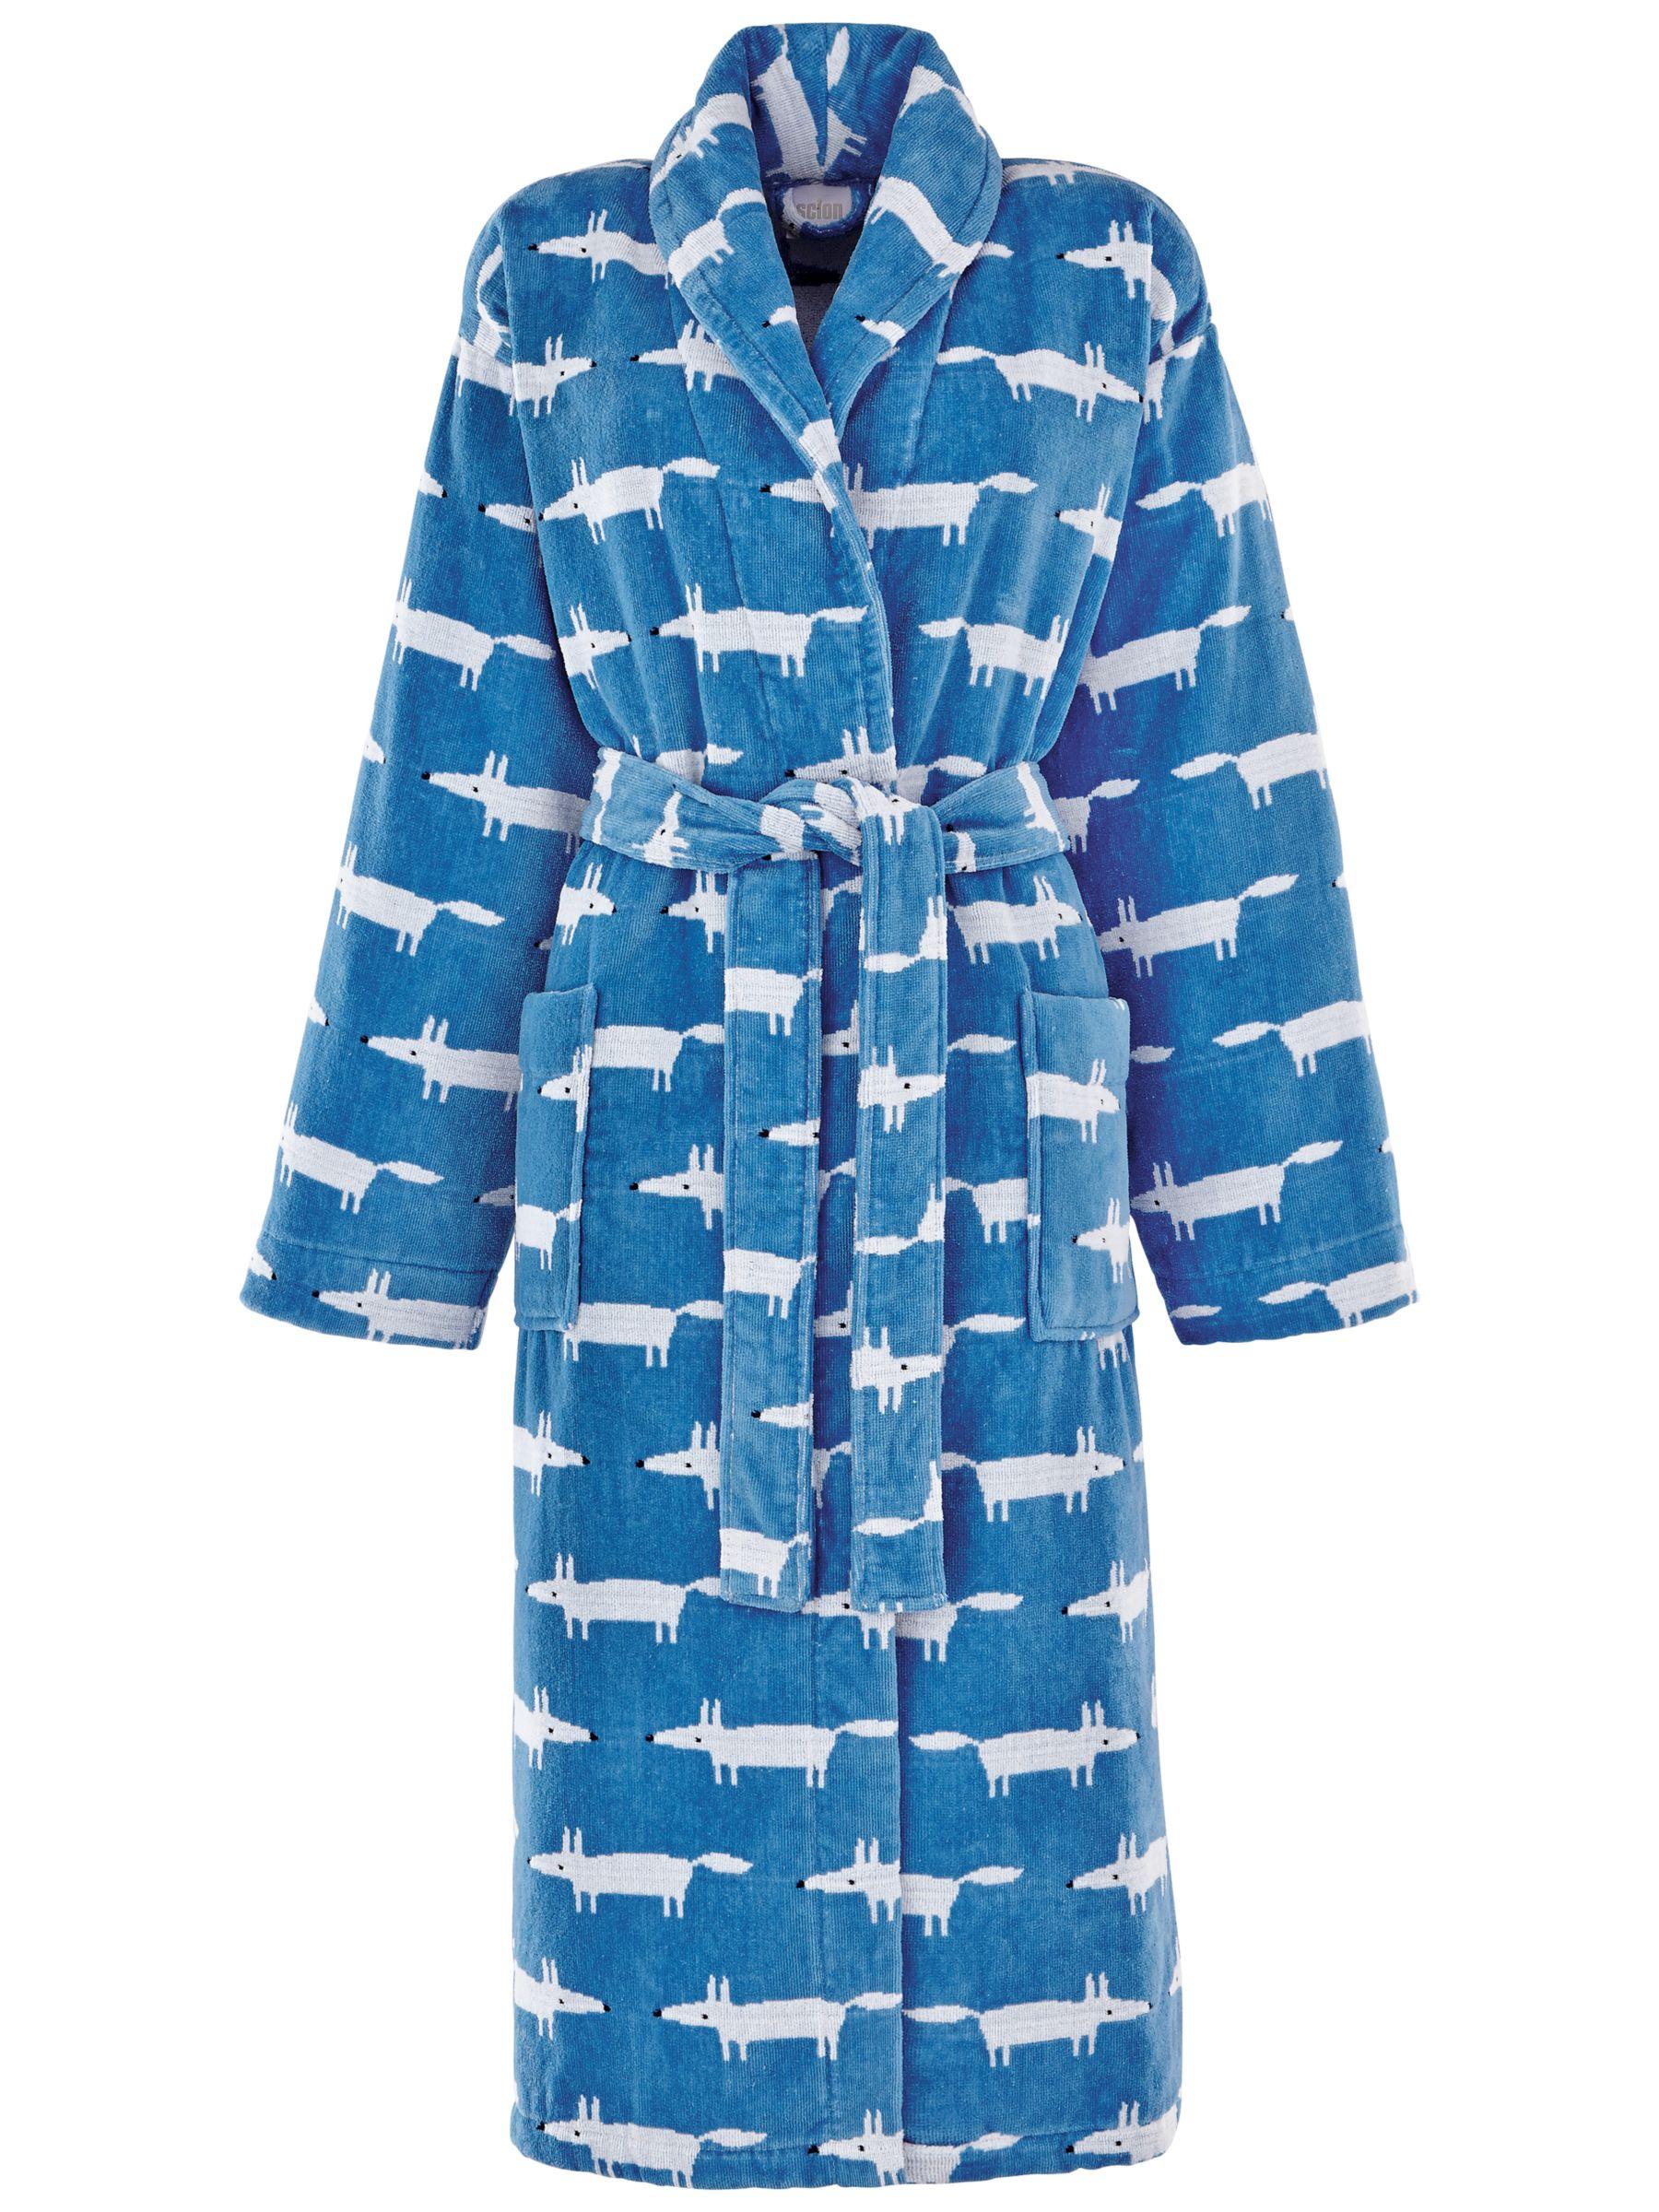 Scion Scion Mr Fox Bath Robe, Denim